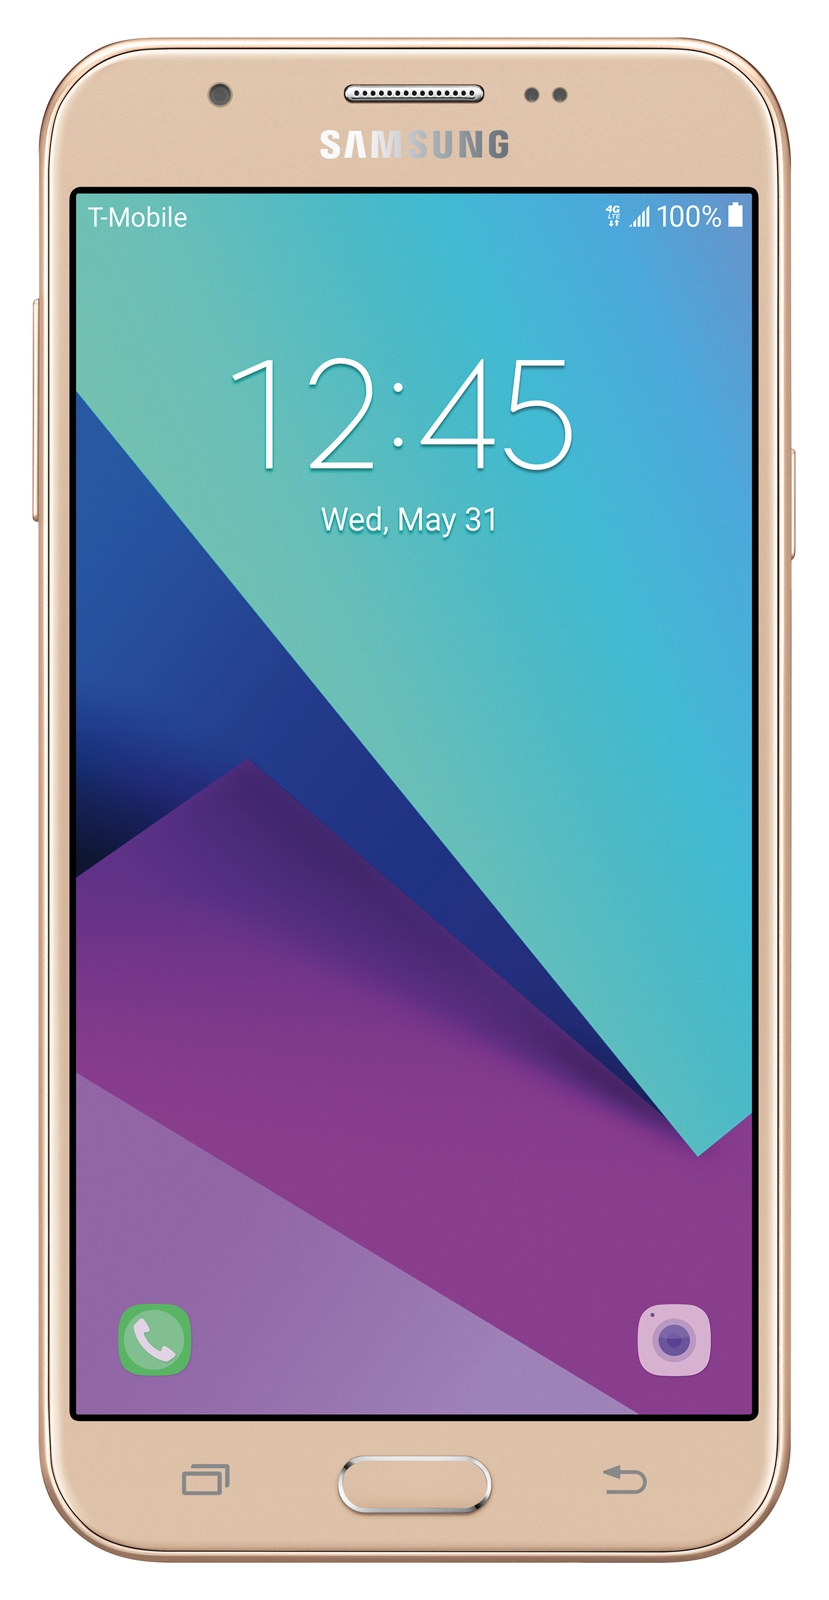 Galaxy J7 Prime (T-Mobile) Phones - SM-J727TZDATMO | Samsung US